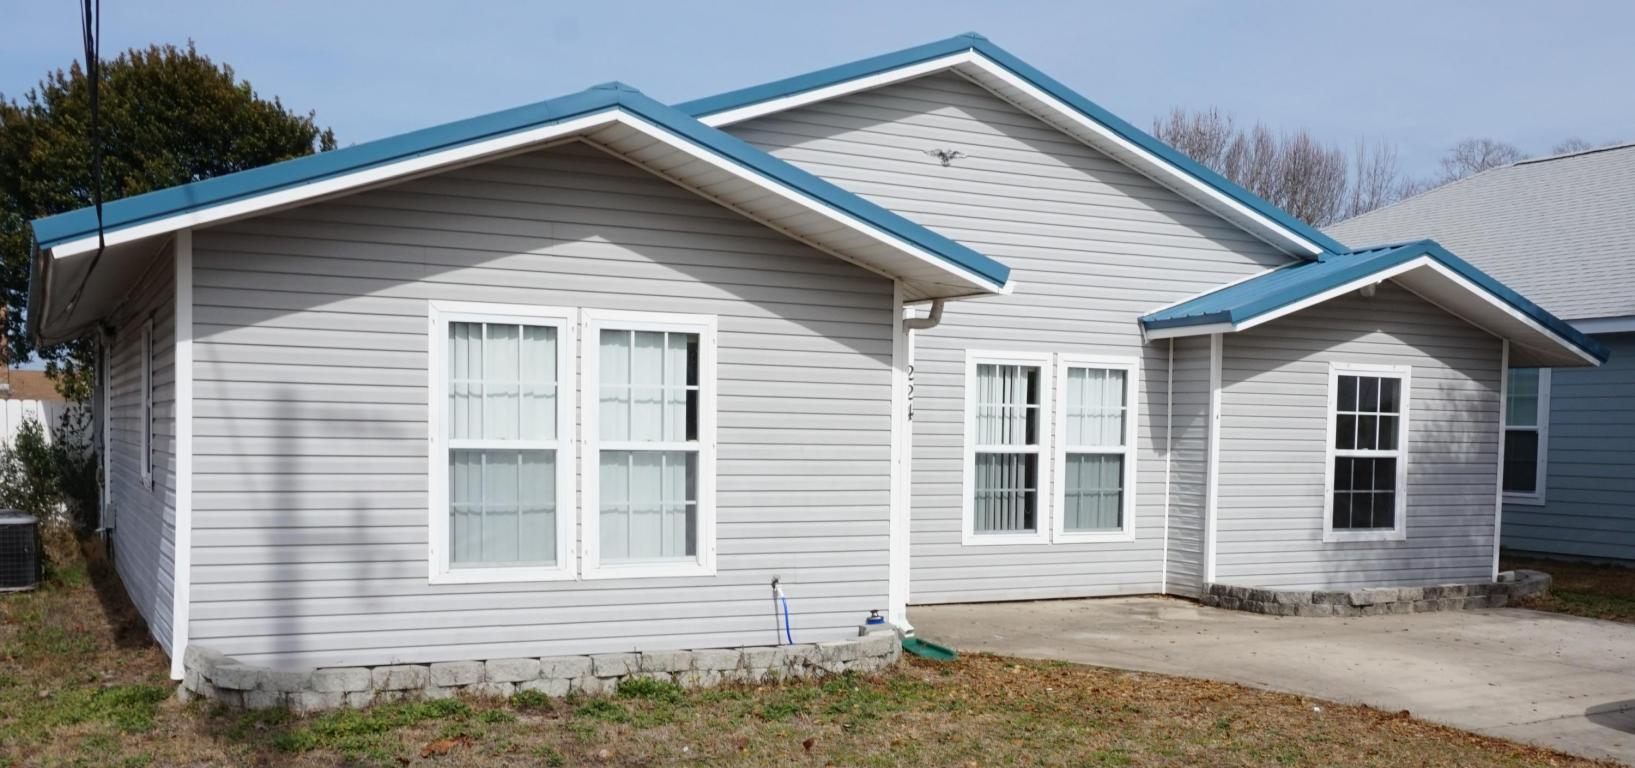 Property ID 790580